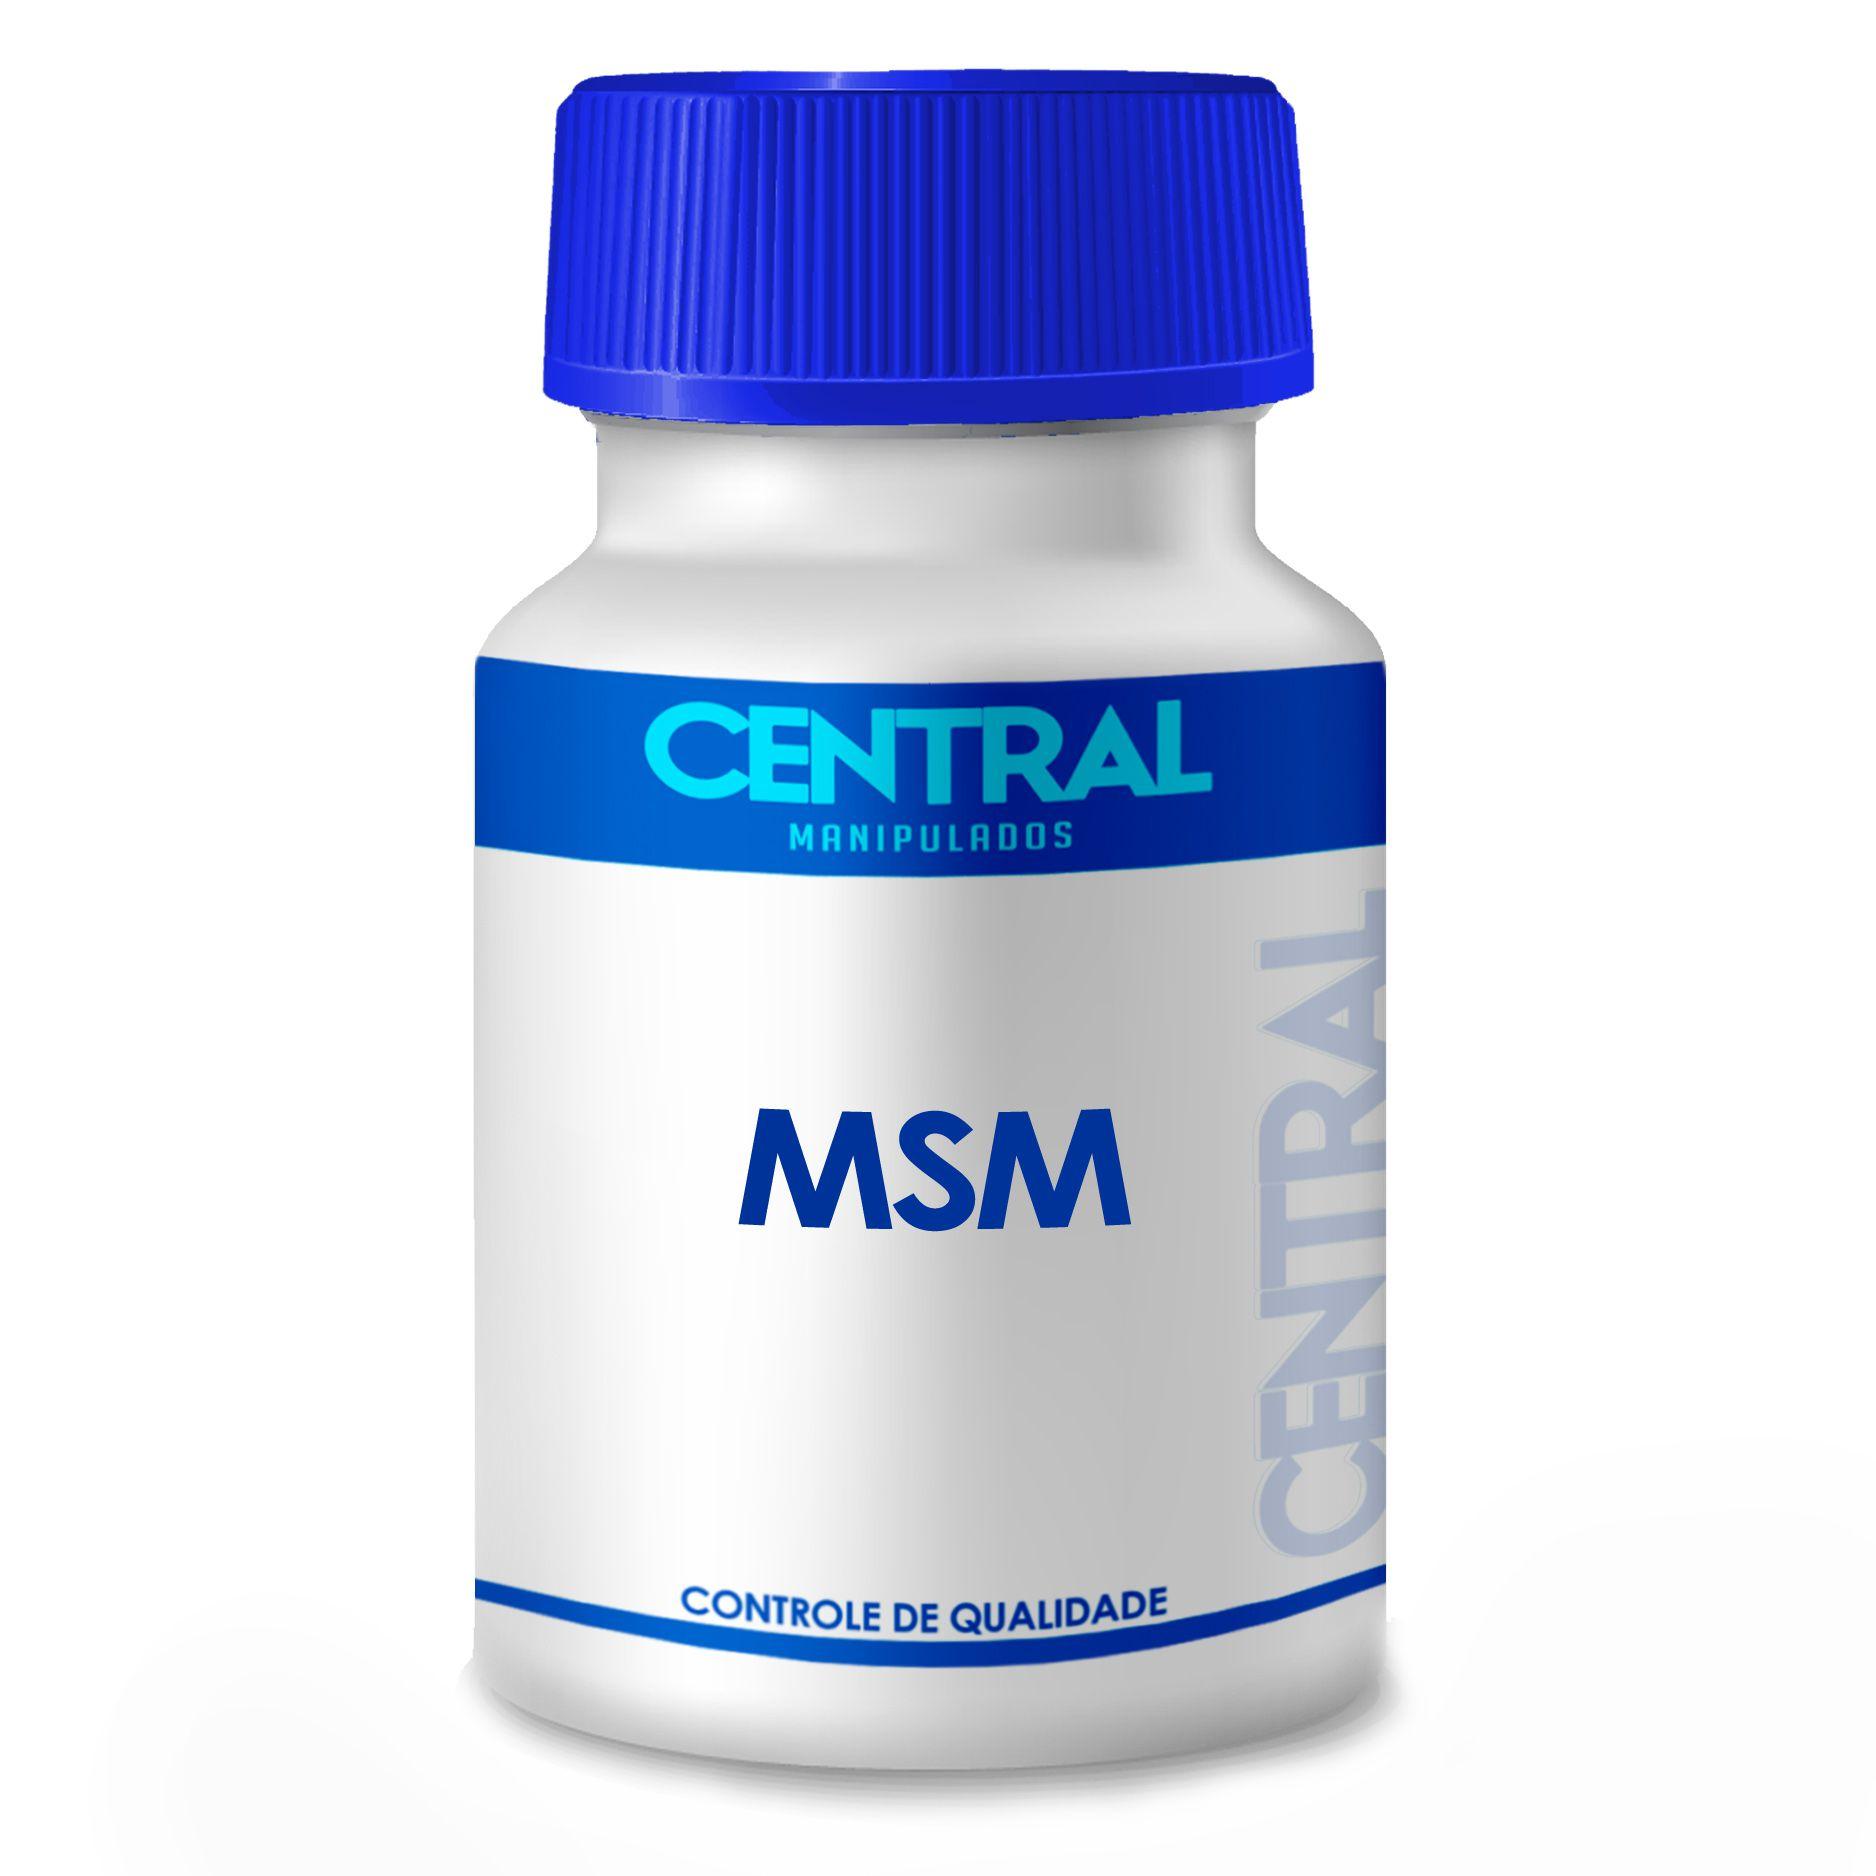 MSM - forma natural de enxofre orgânico - 500mg  - 60 cápsulas